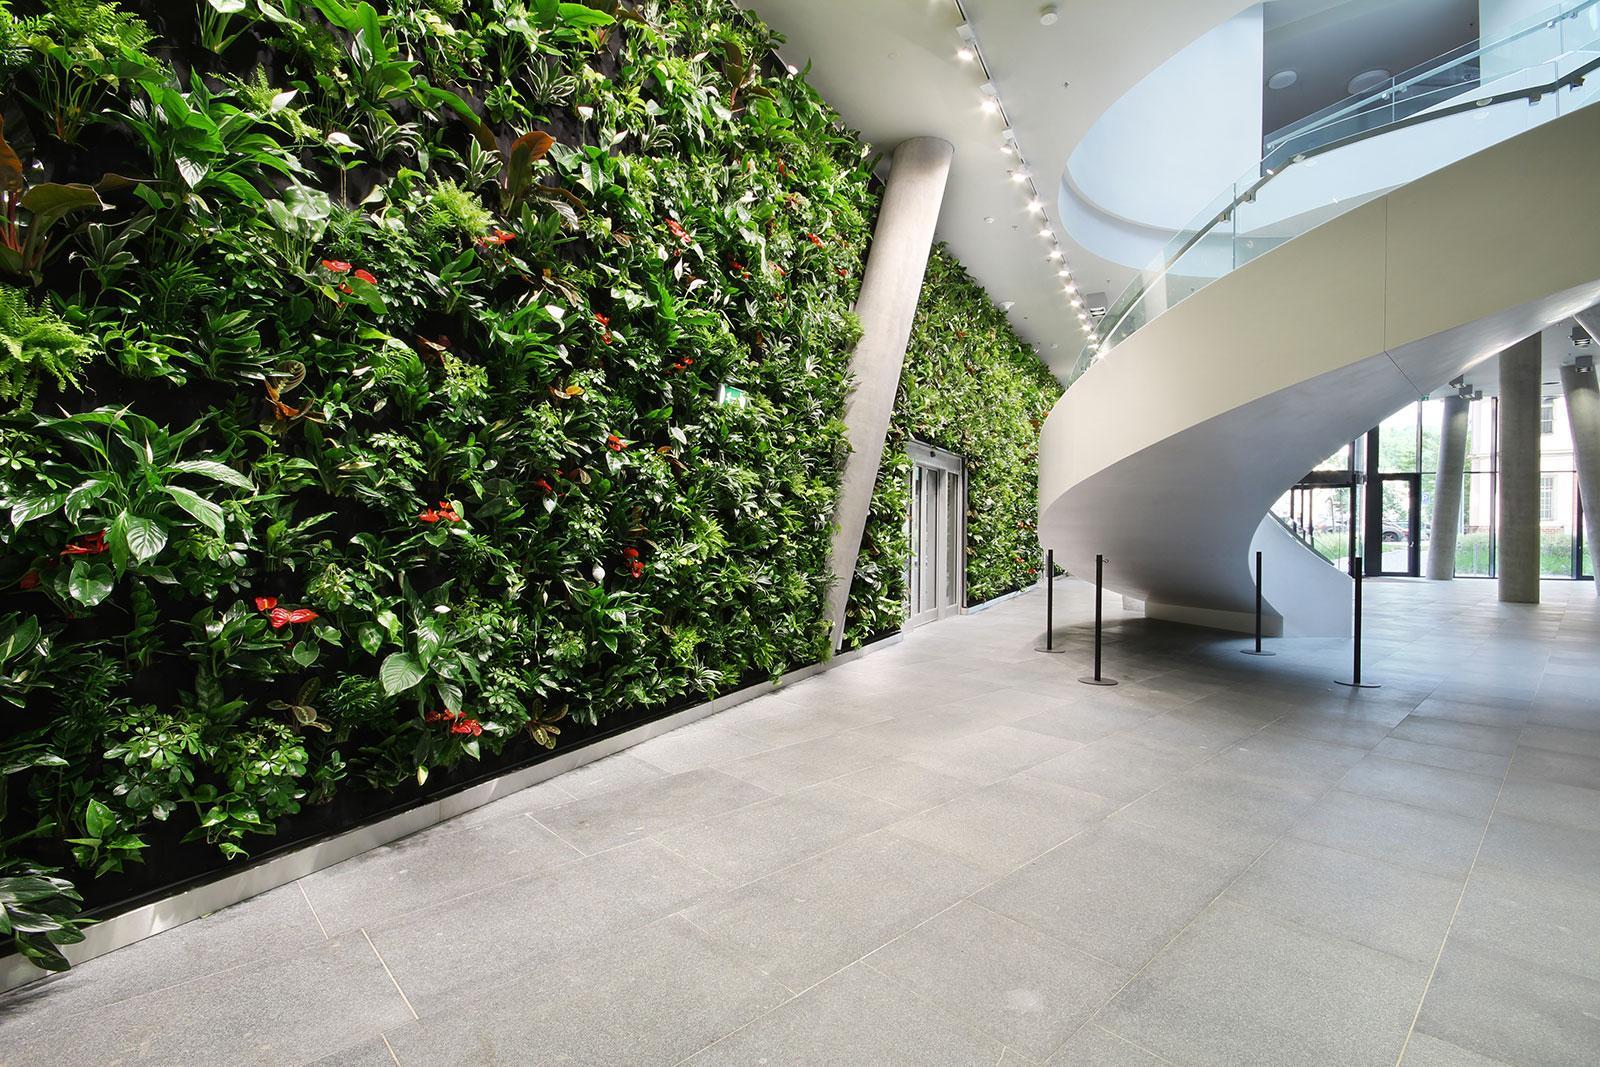 Green / Living Wall Nemec system